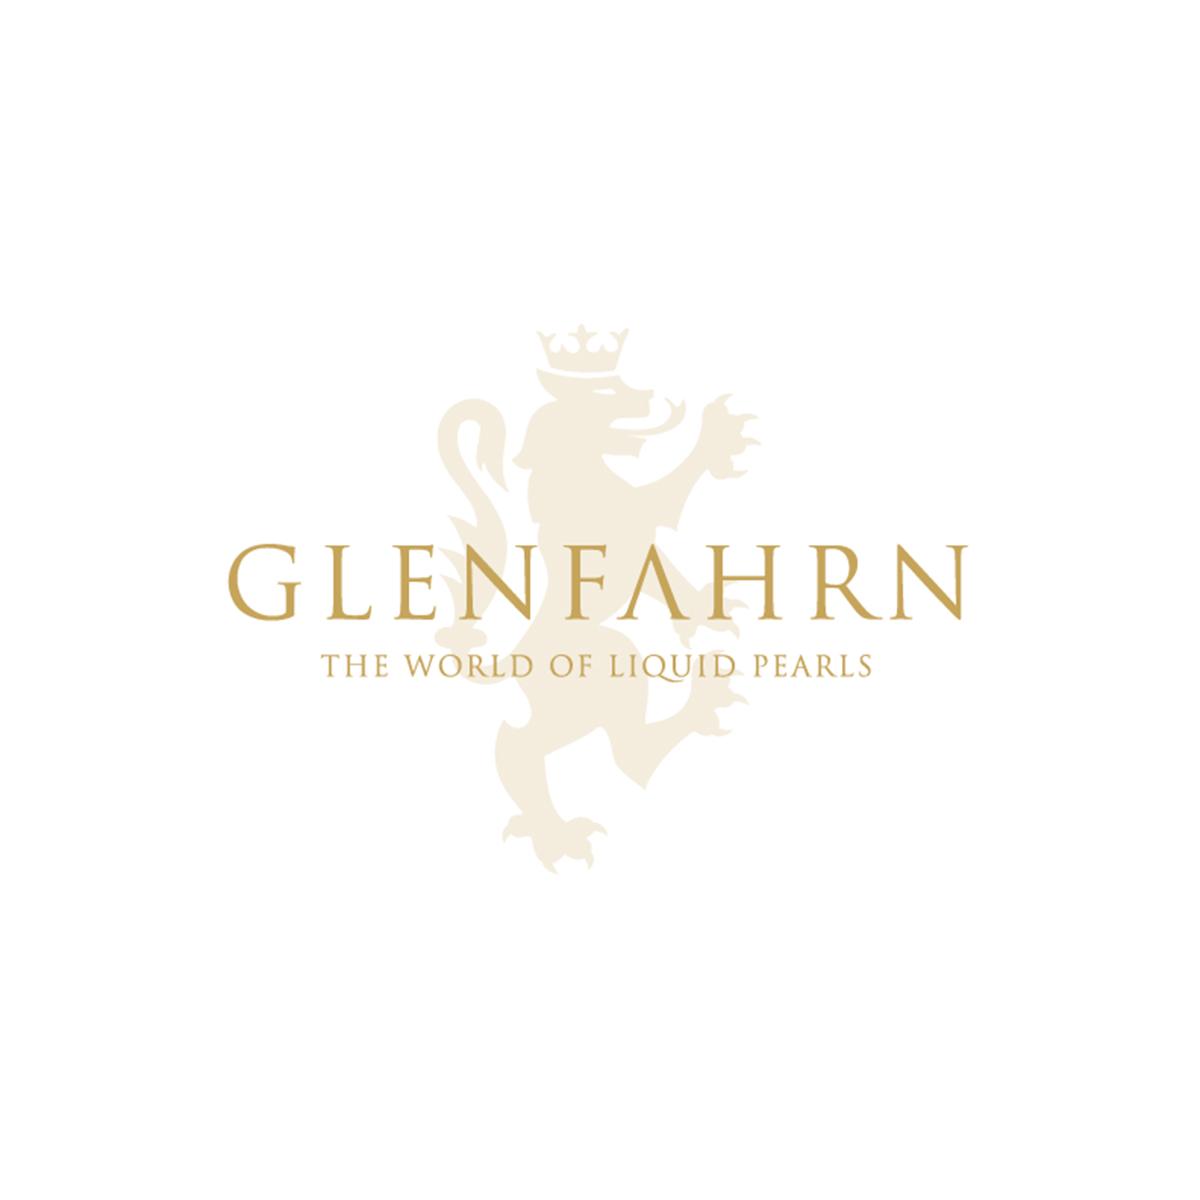 Schatzkiste Glen Fahrn